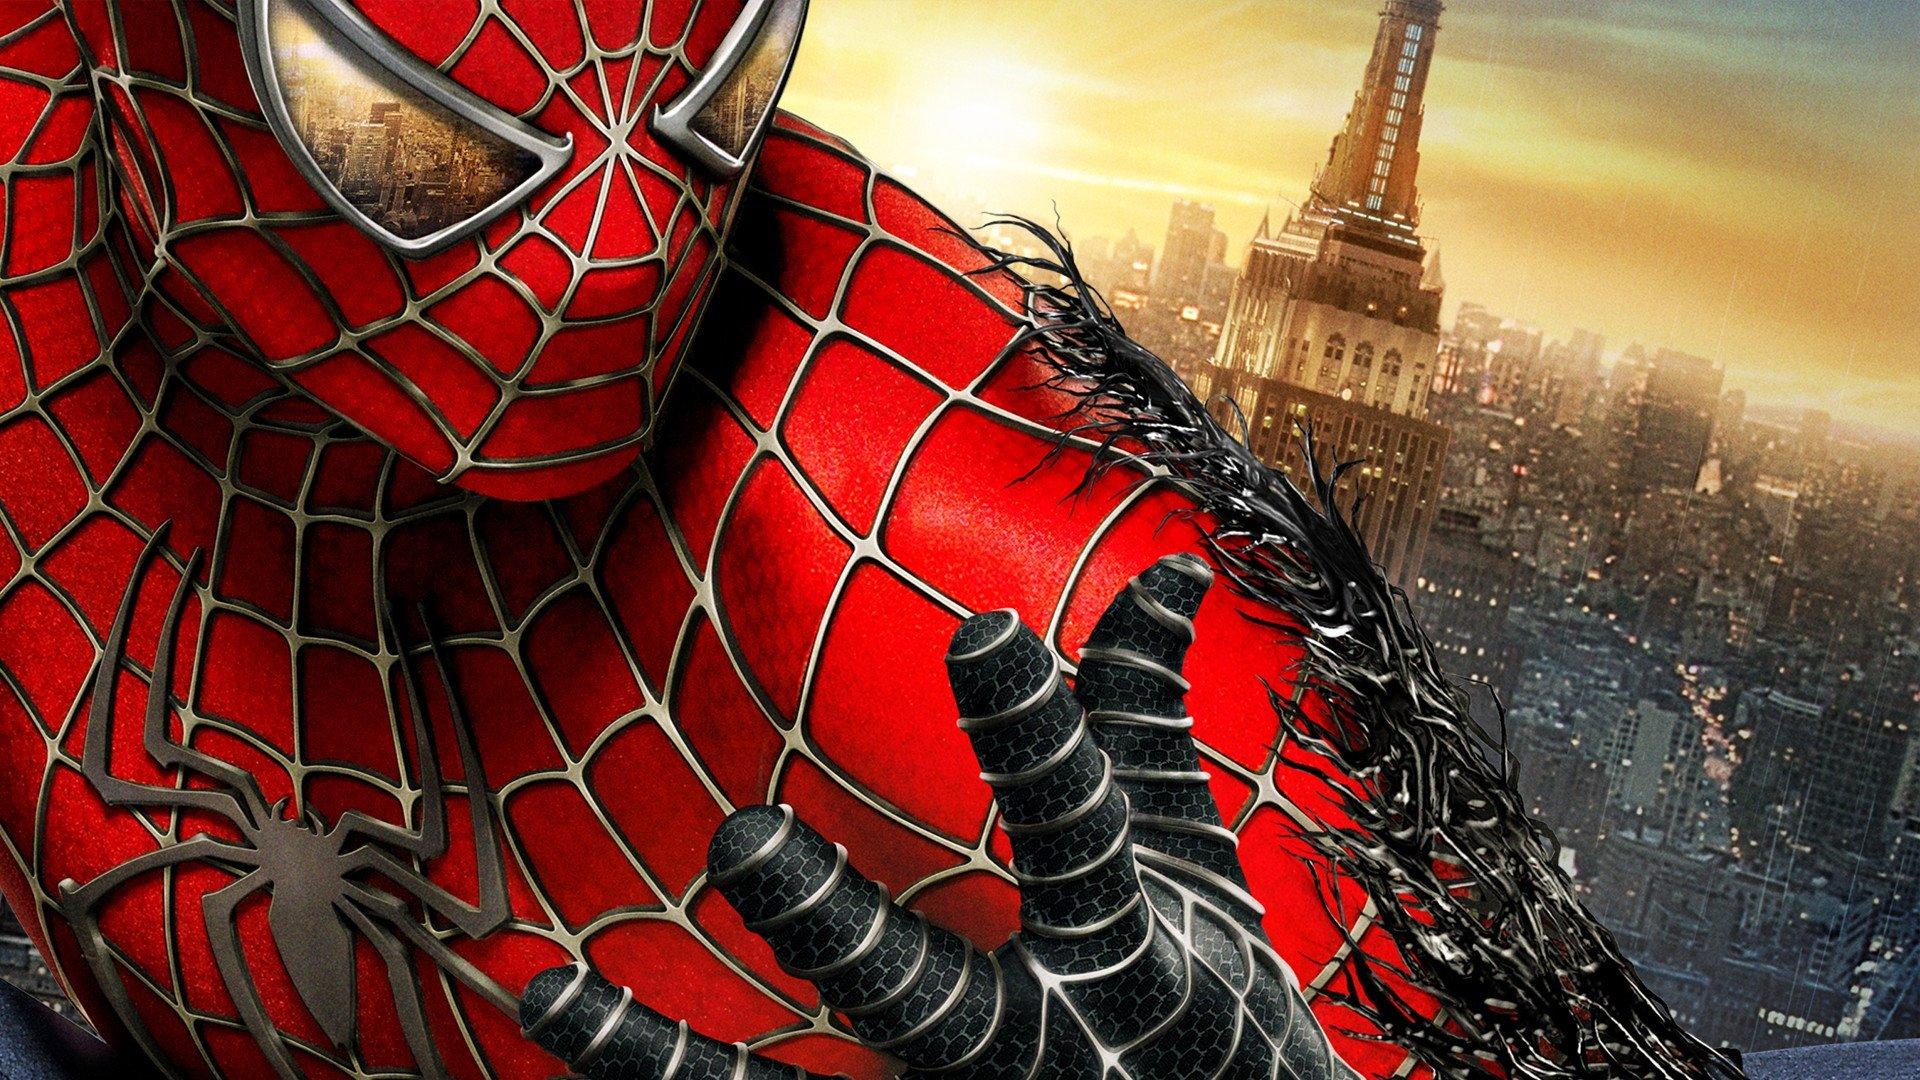 Spider Man 3 Wallpapers 1920x1080 Full HD 1080p Desktop Backgrounds